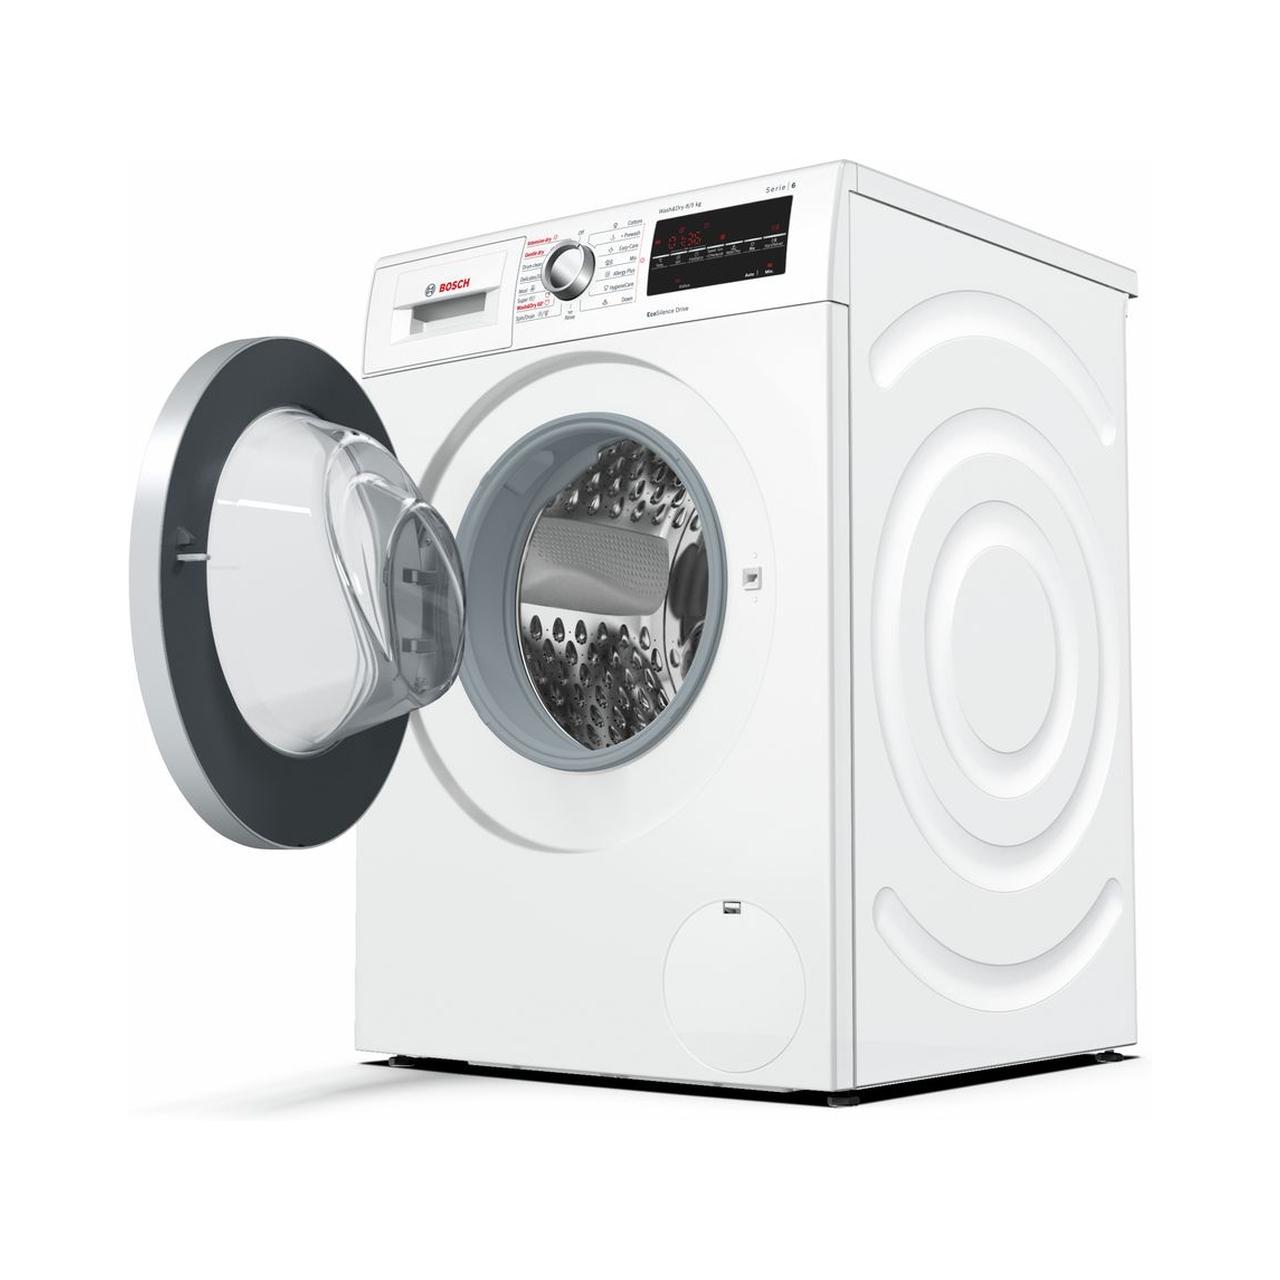 Máy giặt kết hợp sấy BOSCH HMH.WVG30462SG Serie 6